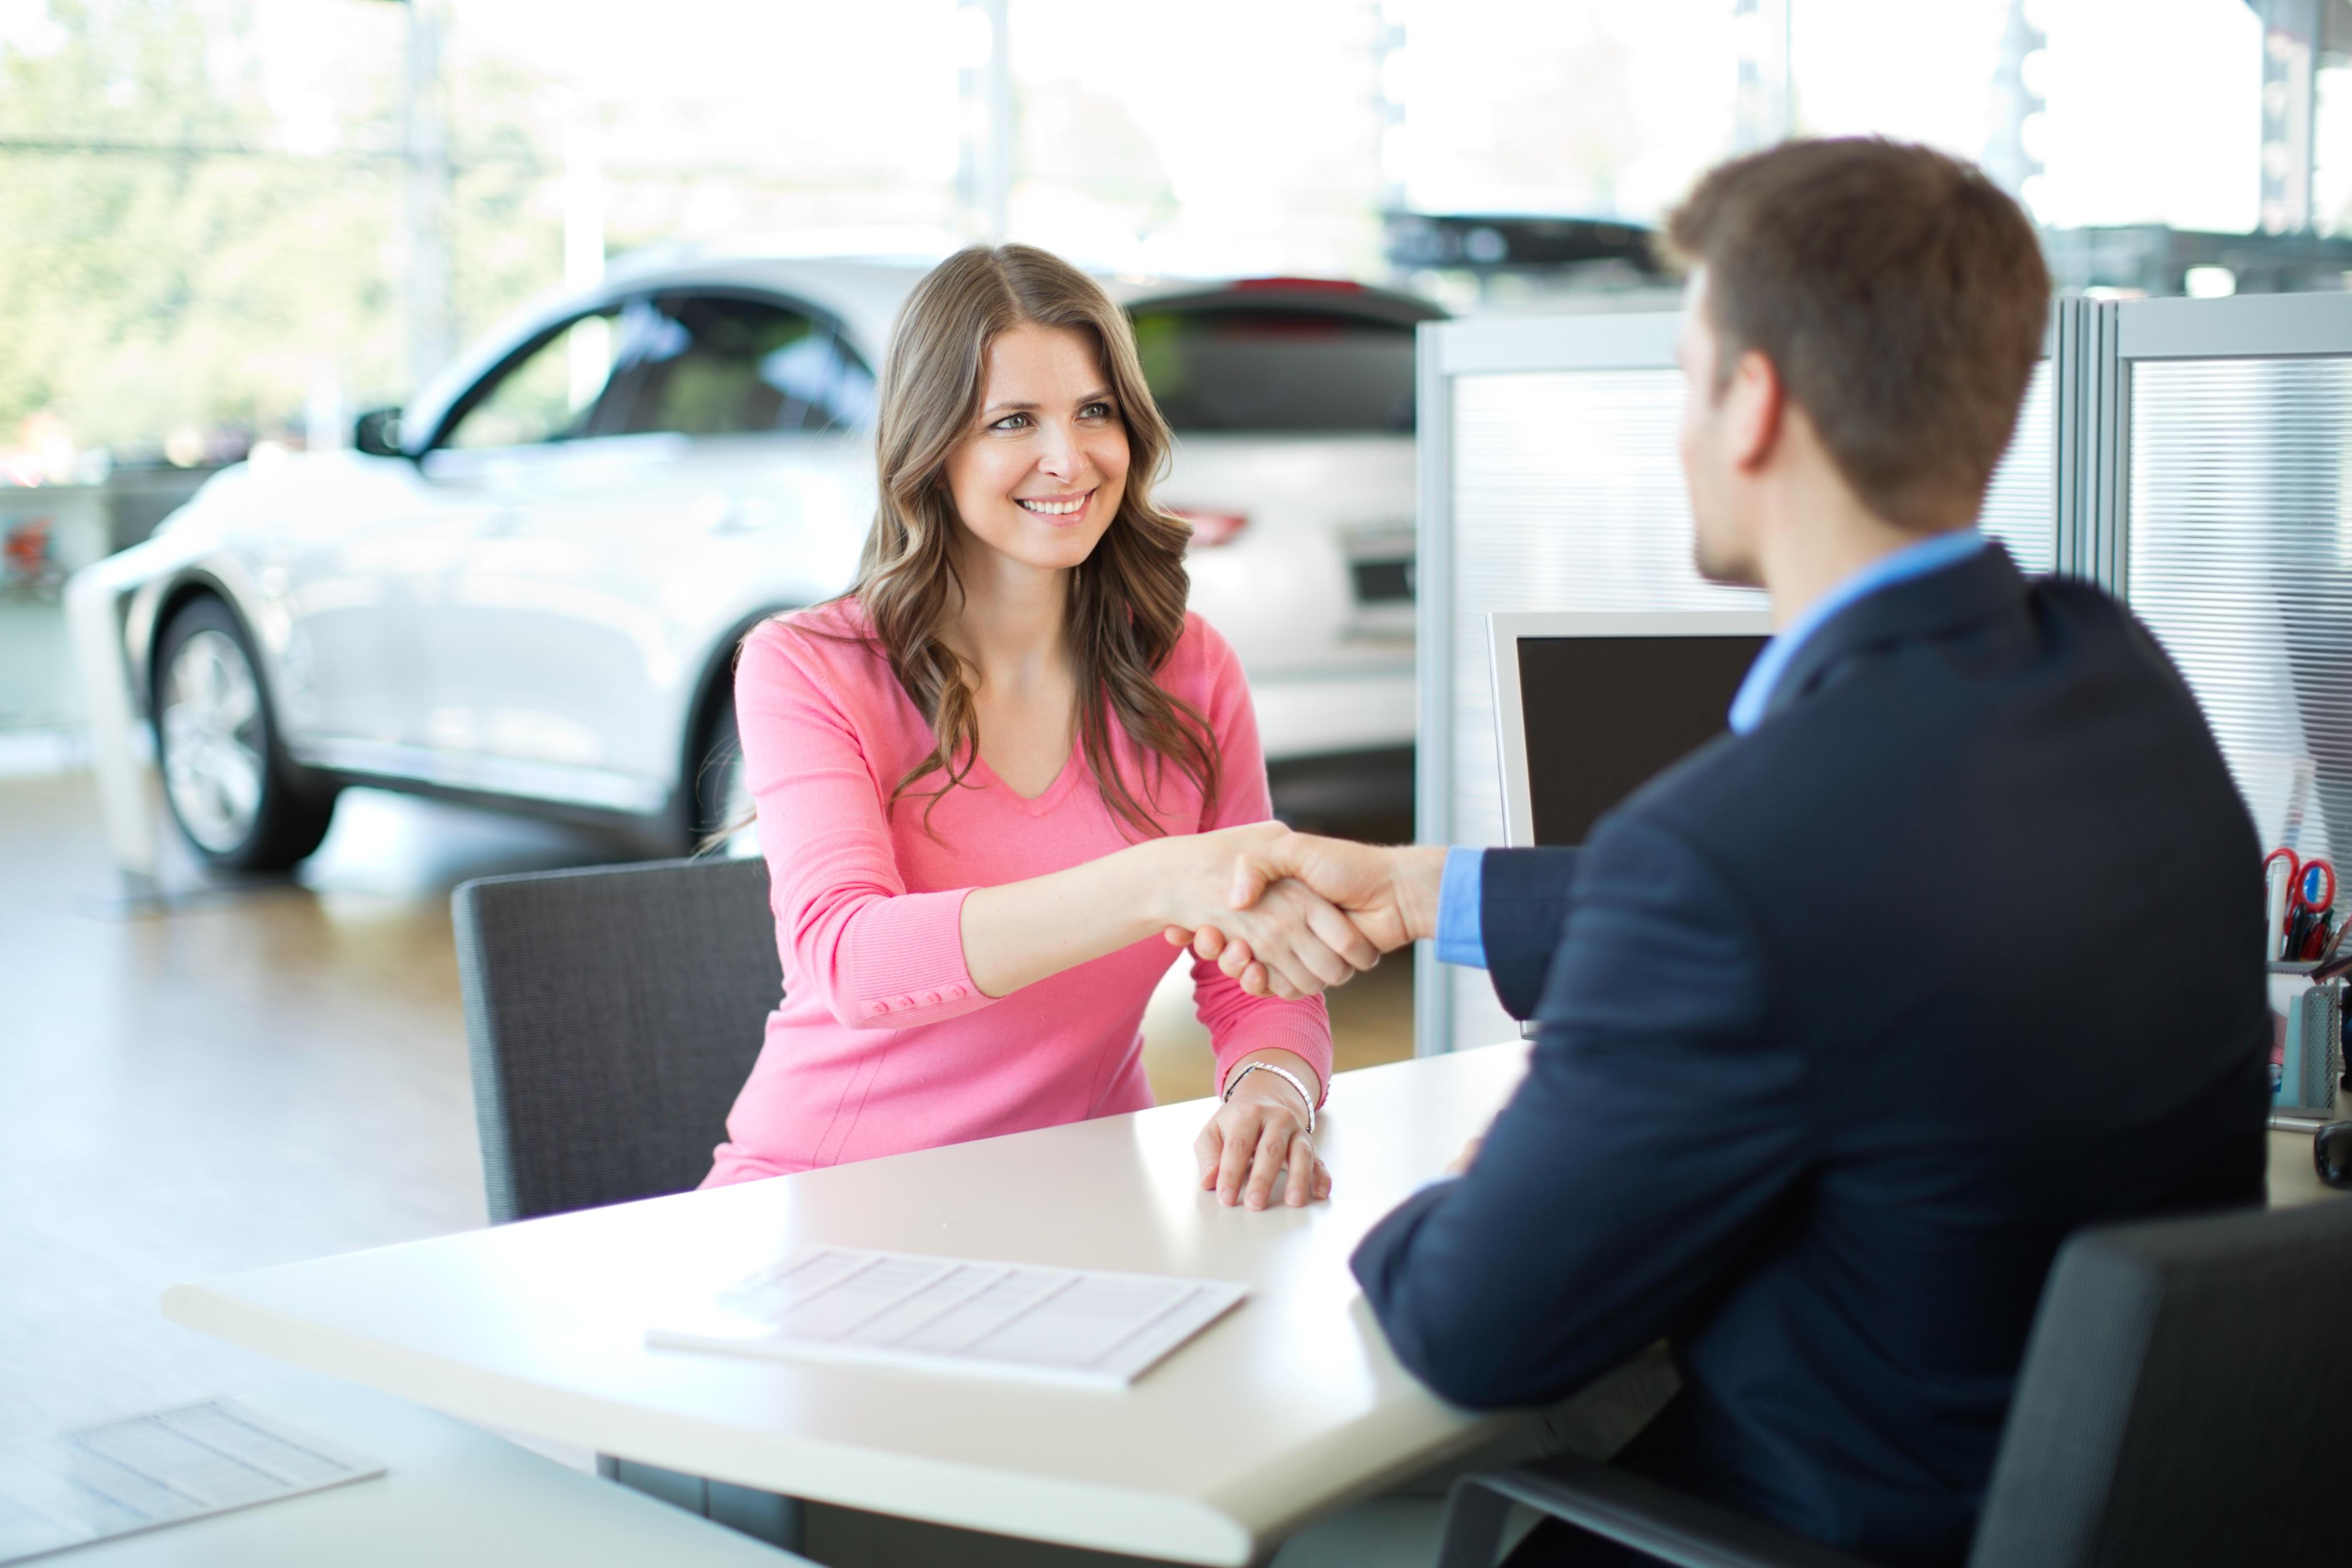 Priority Honda Chesapeake | Should I Buy or Lease my New Car?